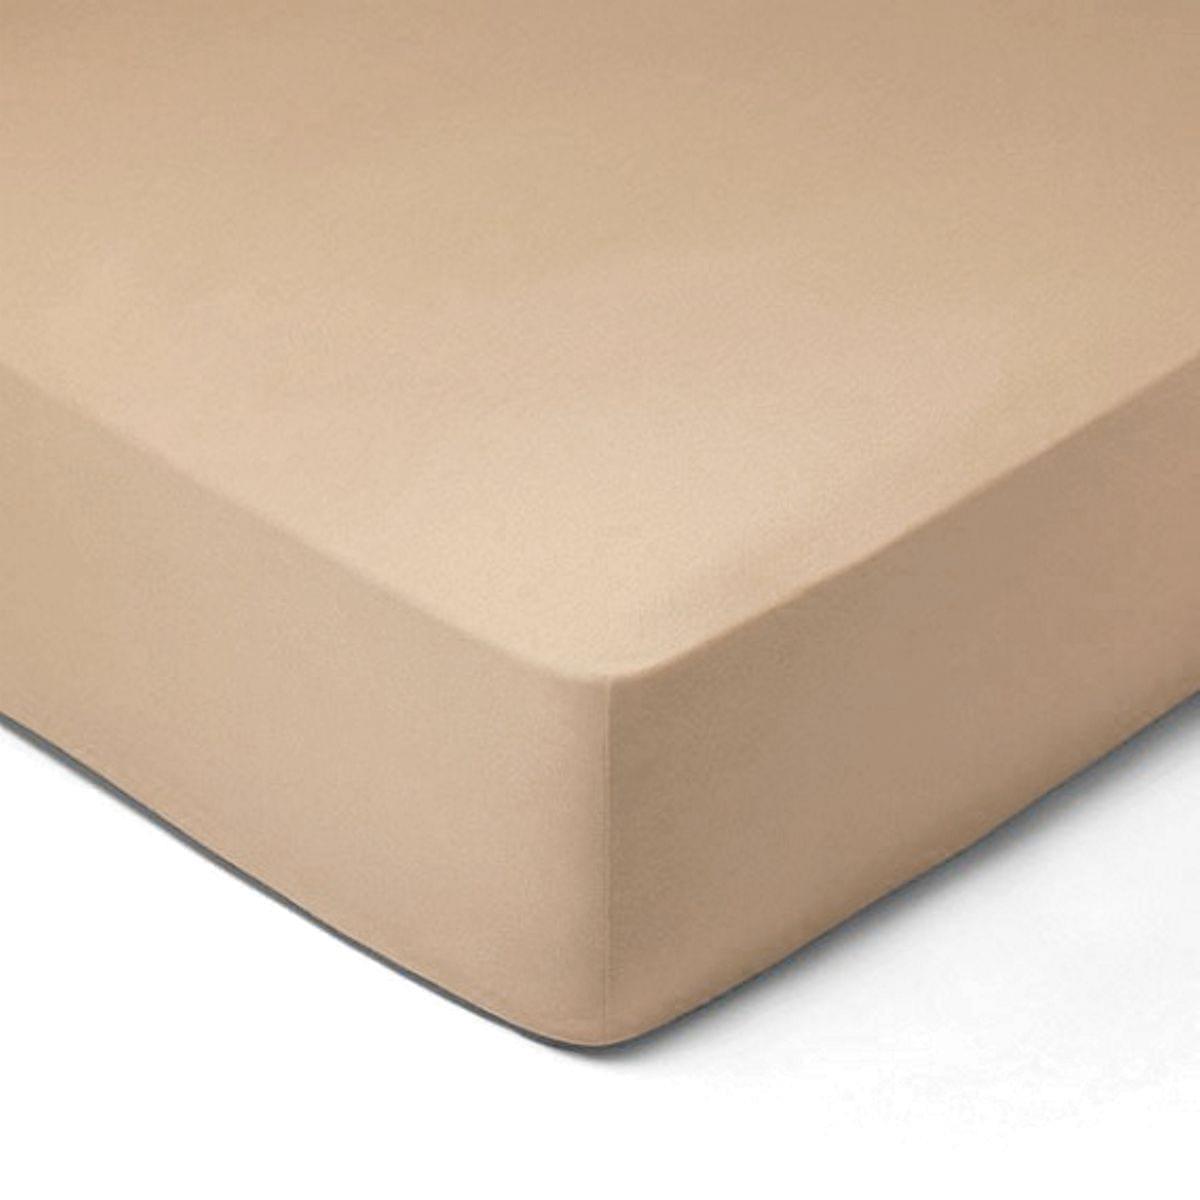 Forbyt, Prostěradlo, Jersey, capucino 120 x 200 cm